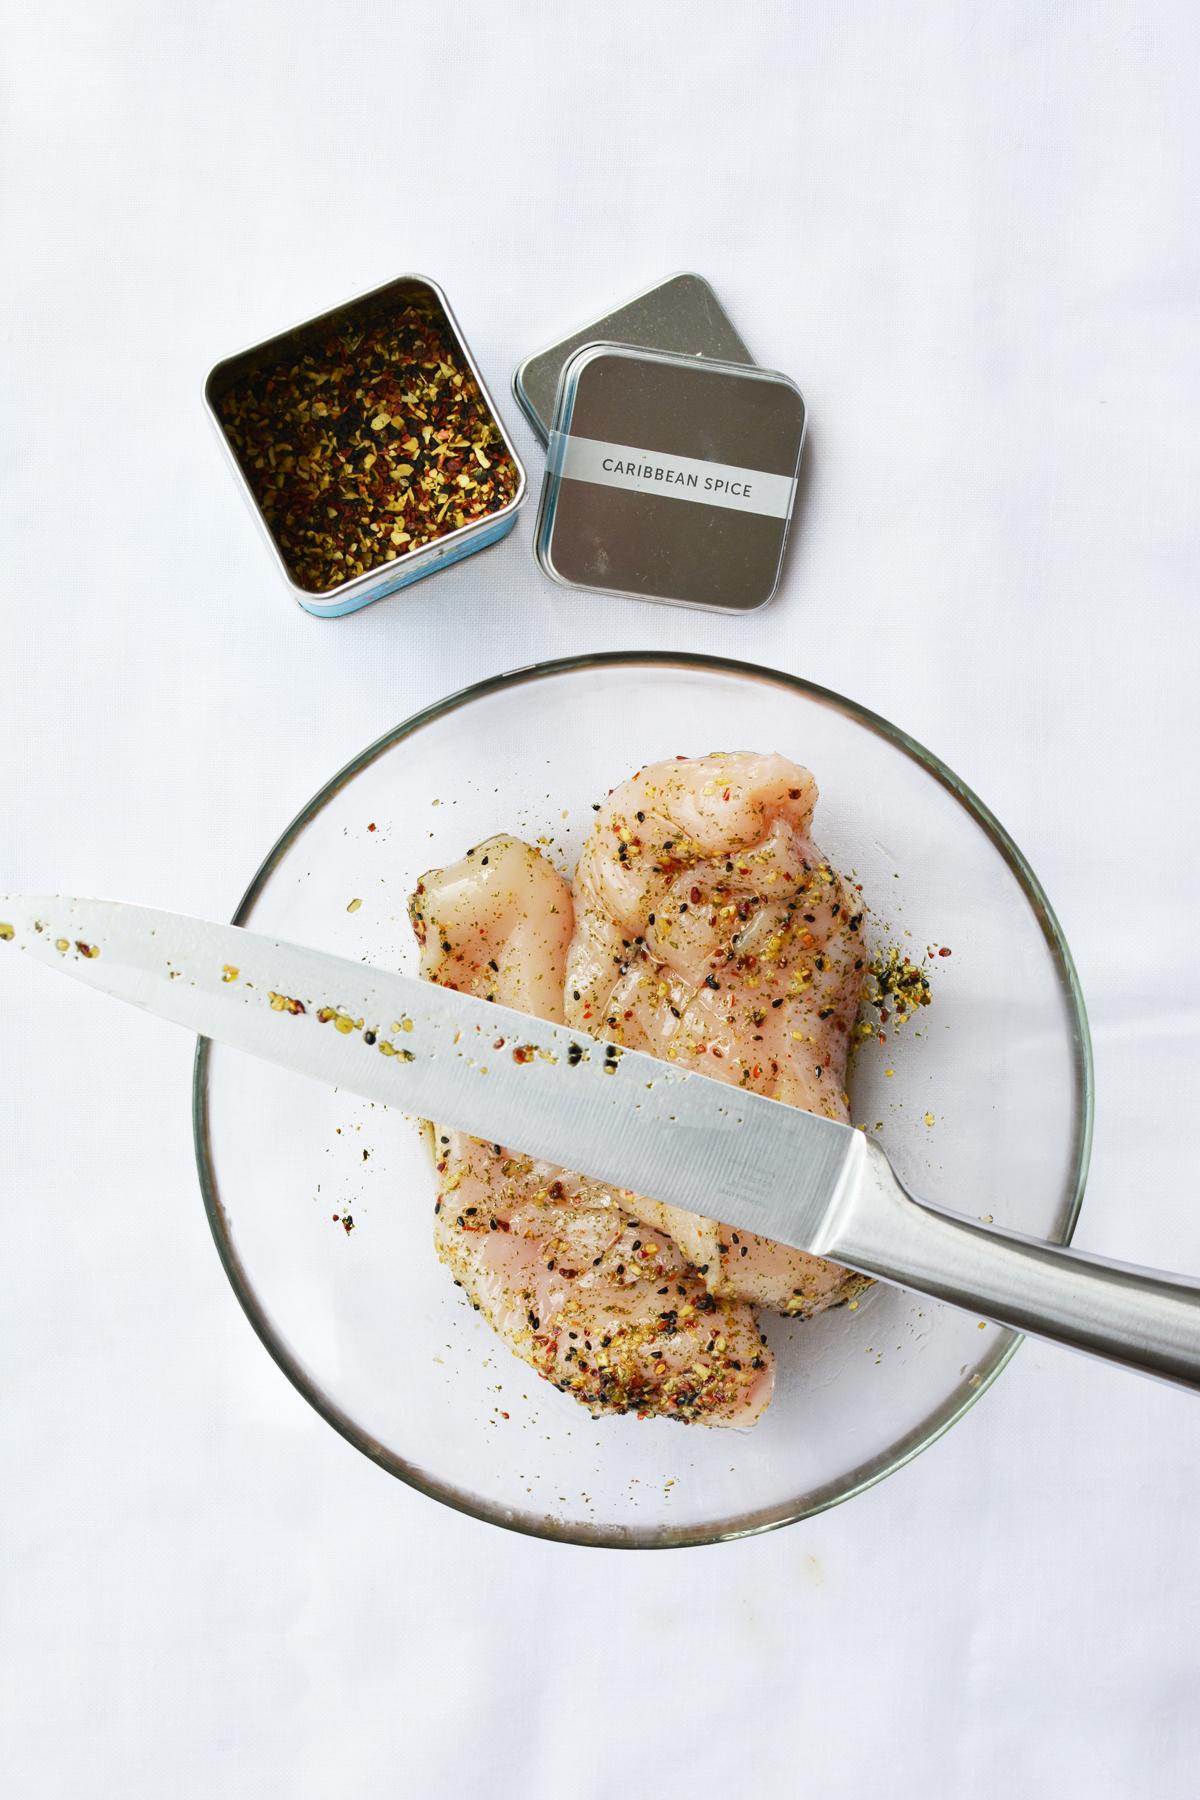 Gegrilde kip met Caribbean spice 15